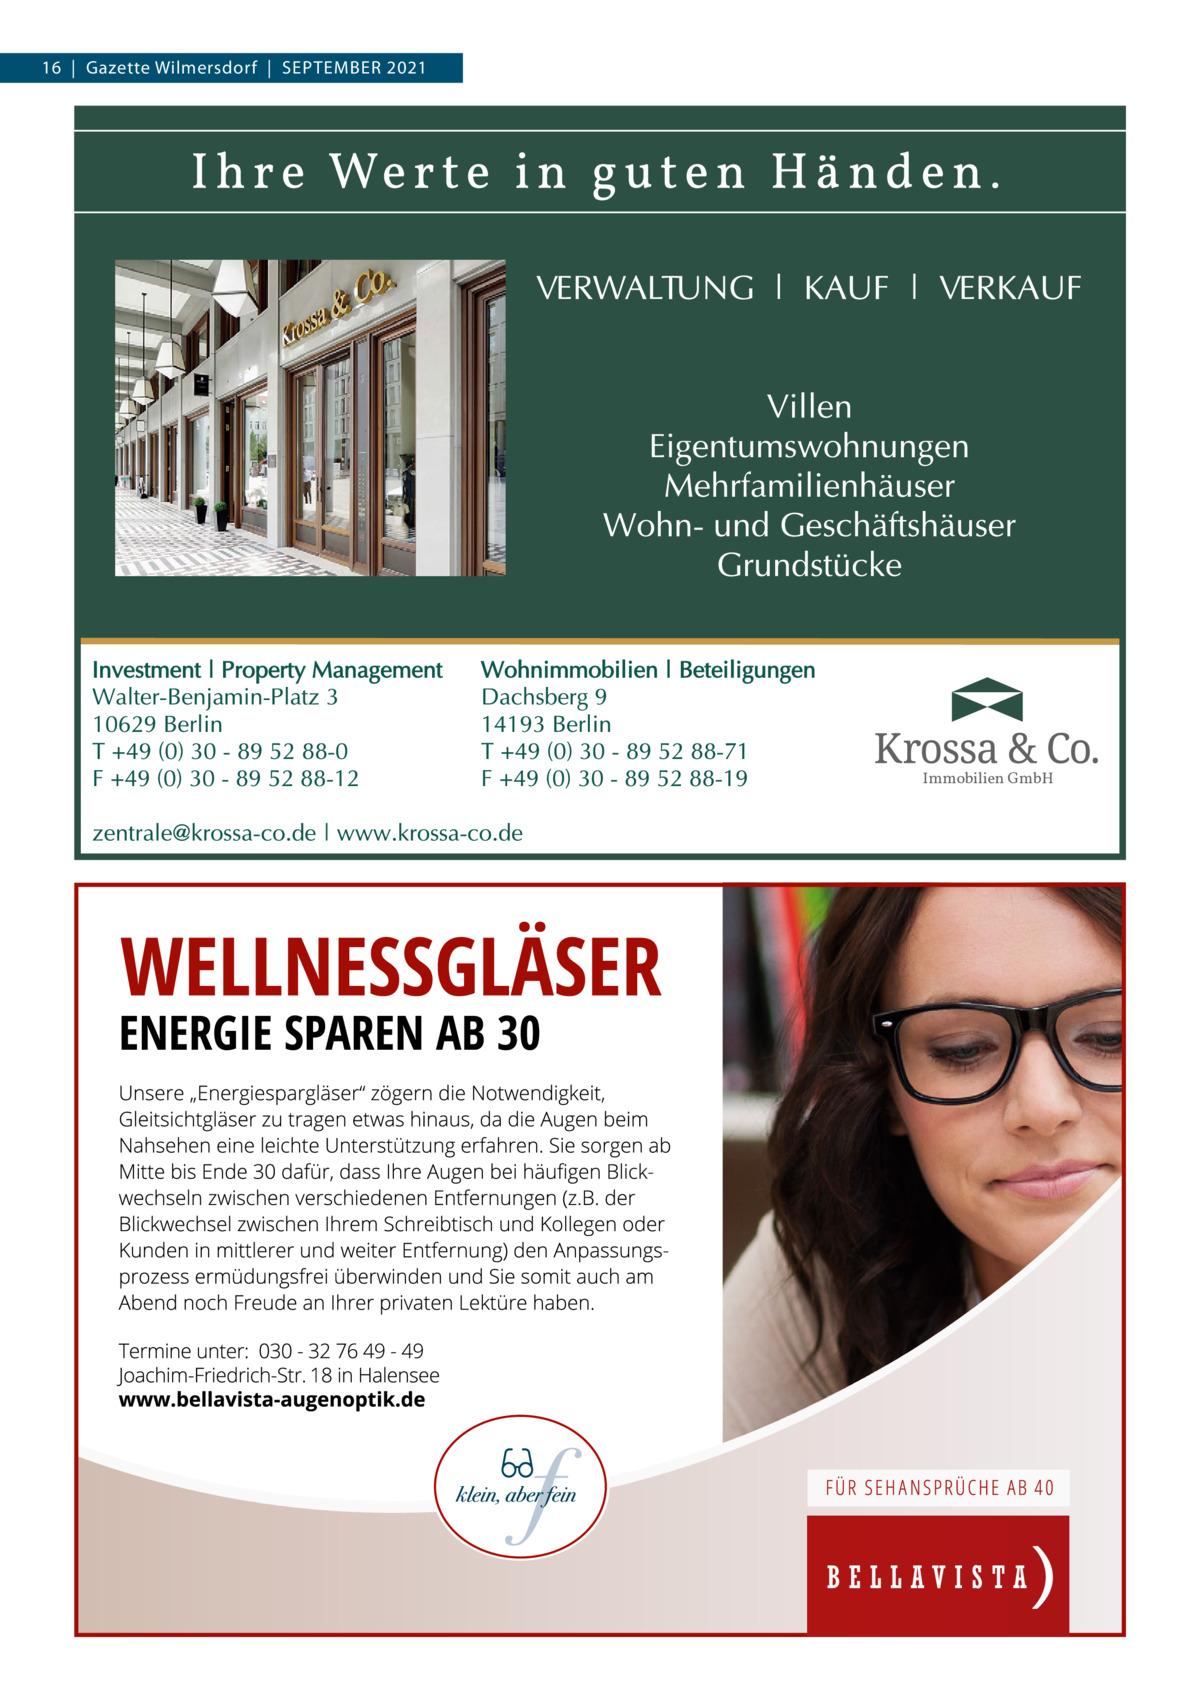 16 Gazette Wilmersdorf September 2021  Immobilien GmbH